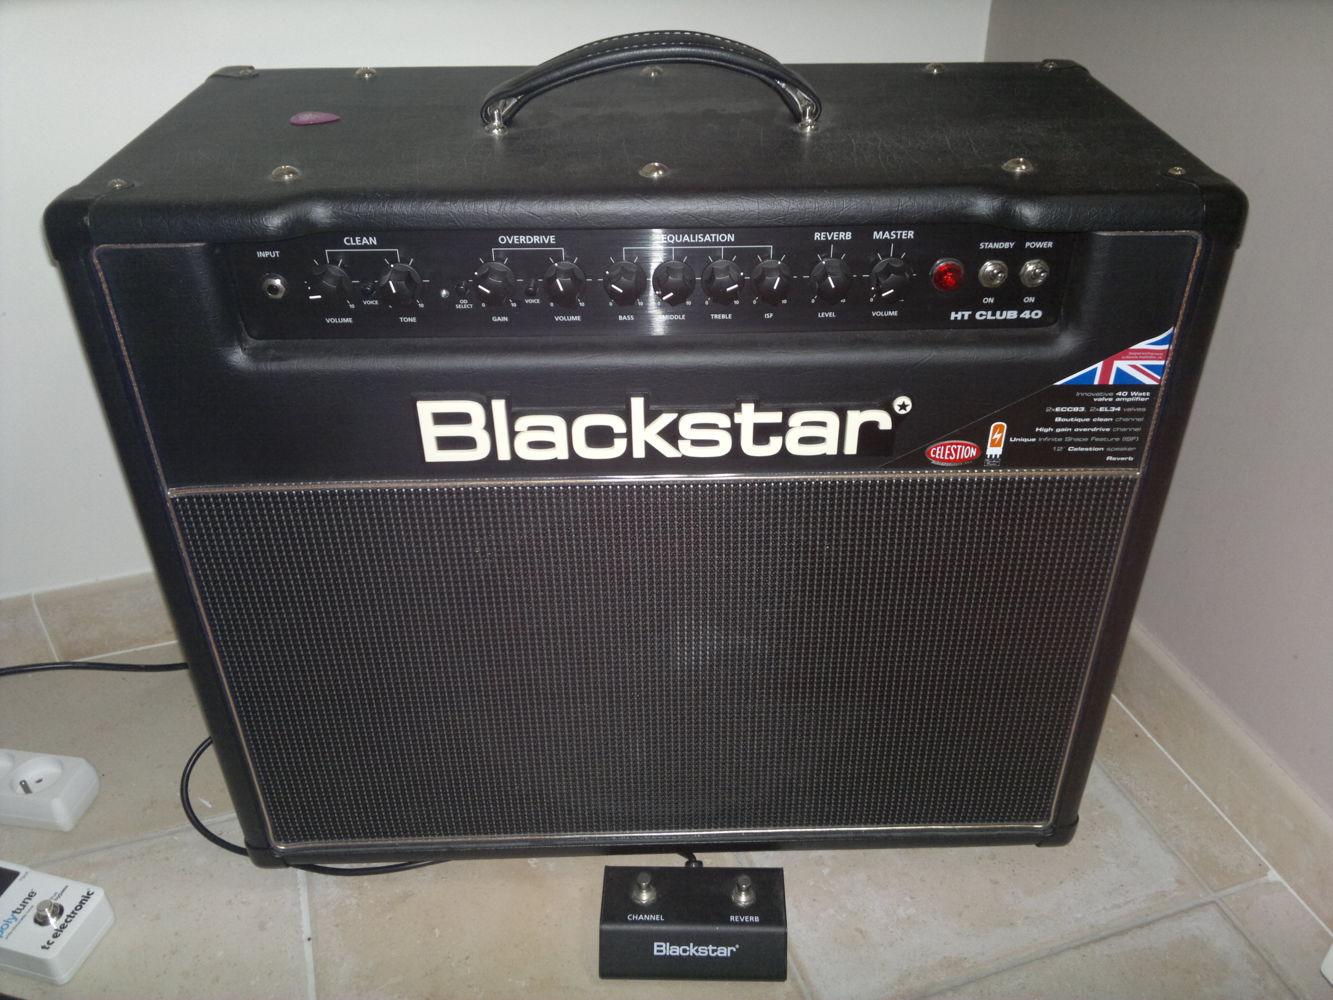 blackstar amplification ht club 40 image 673502 audiofanzine. Black Bedroom Furniture Sets. Home Design Ideas